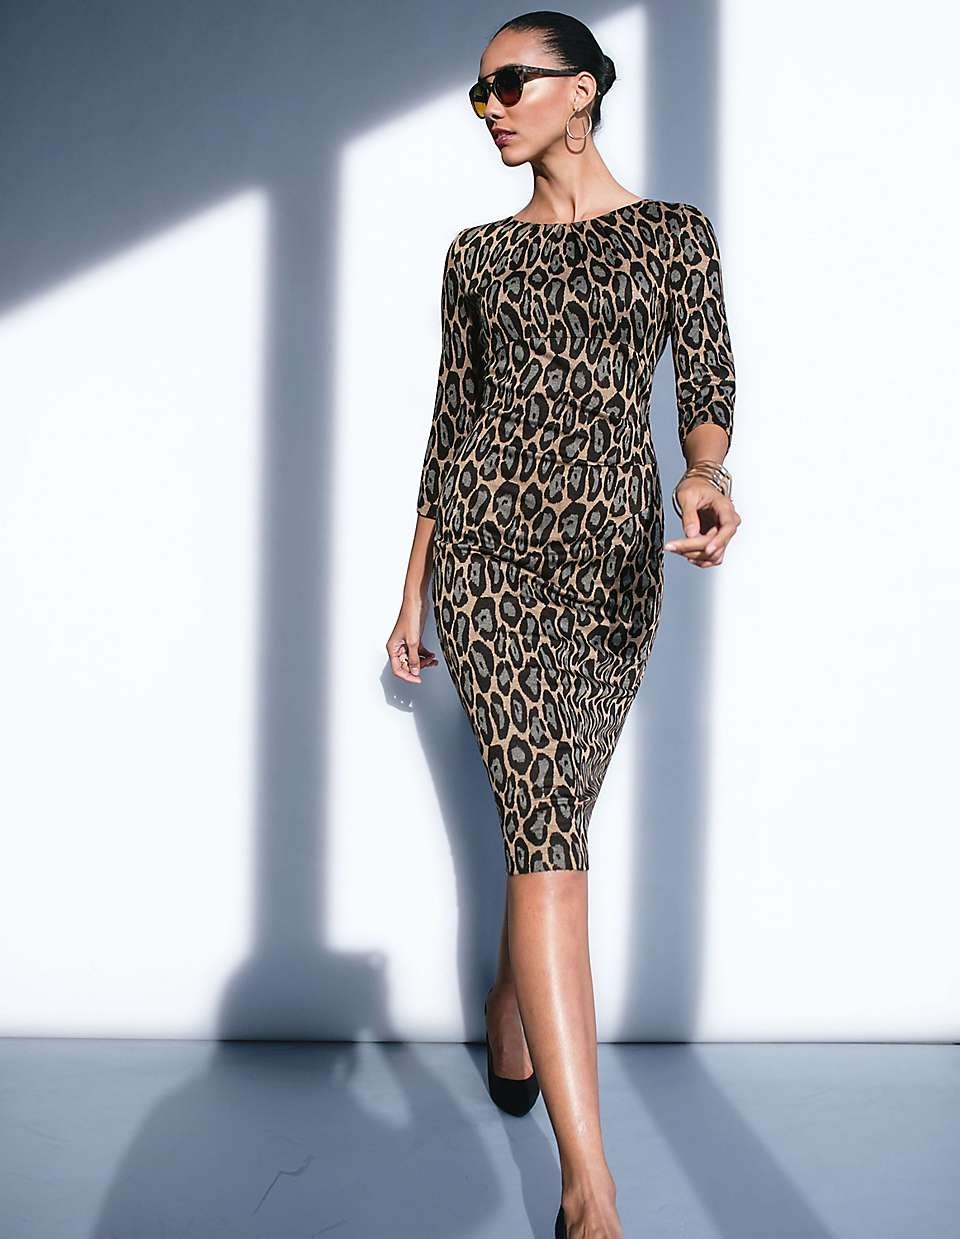 Model im Leoprint-Kleid